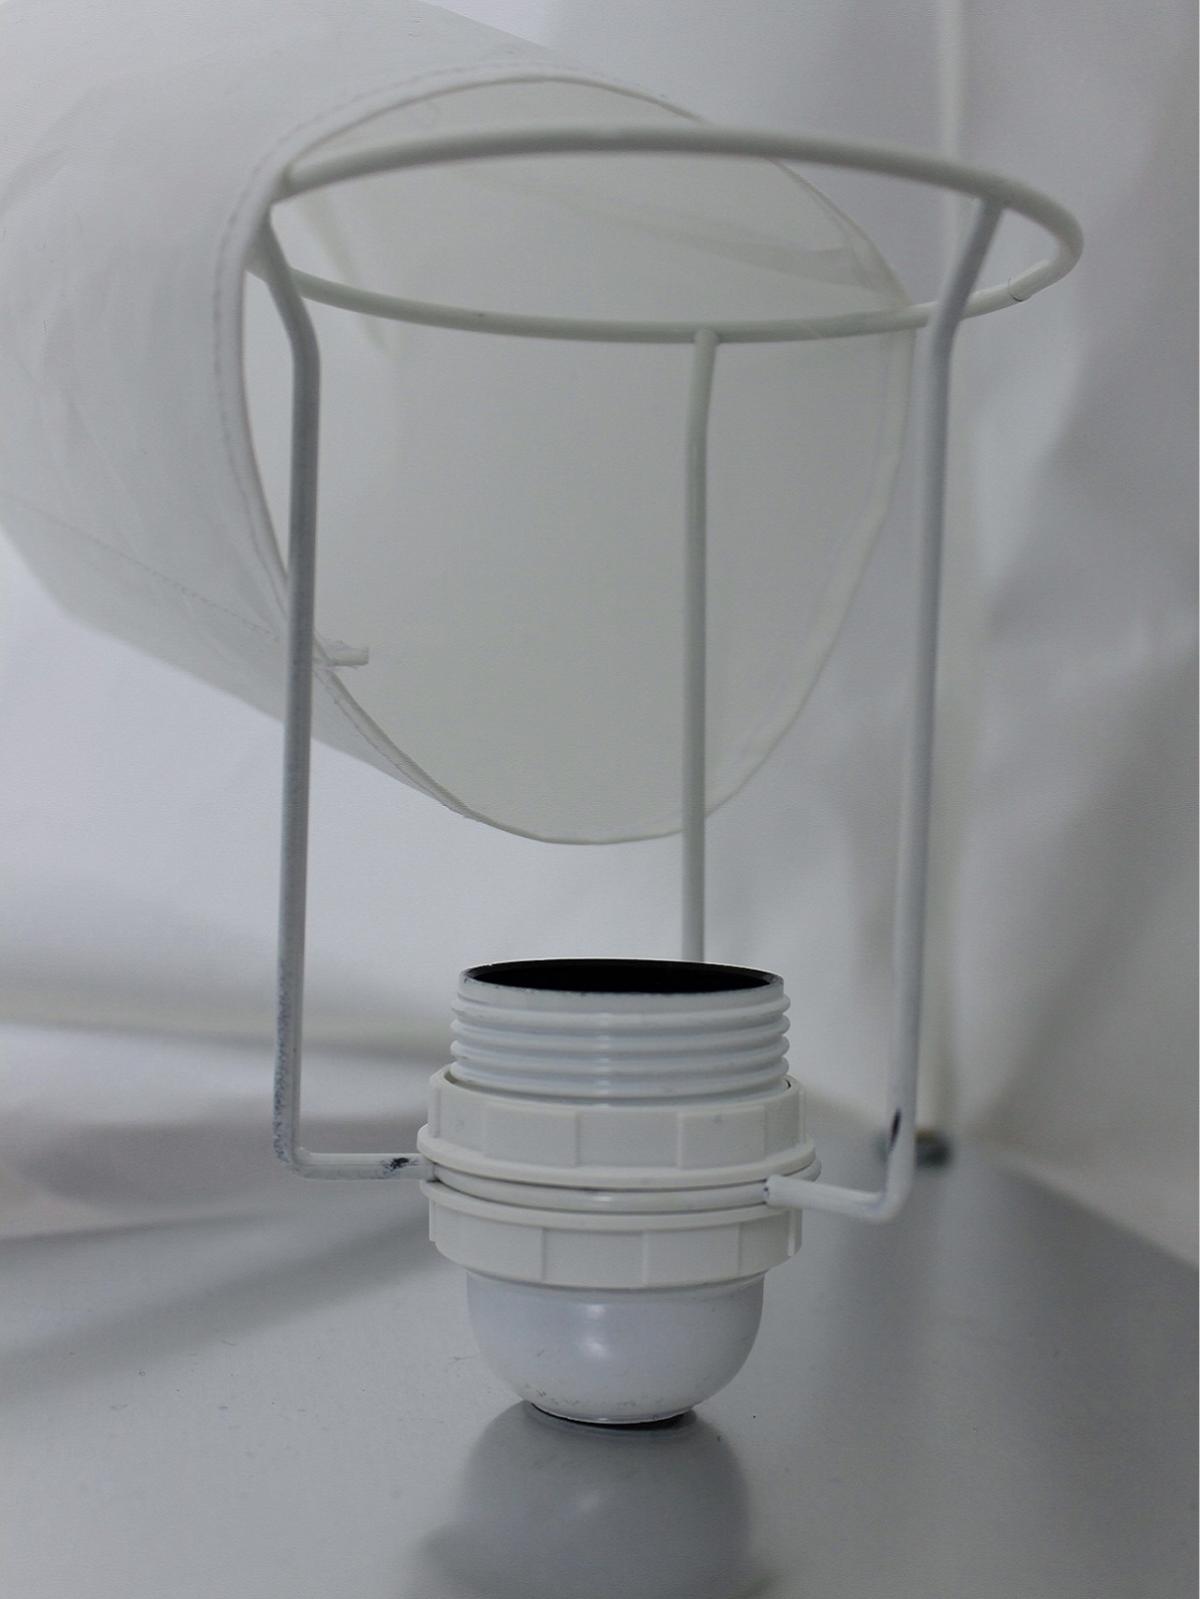 b2-gulvlampe-sikkerhed-detalje